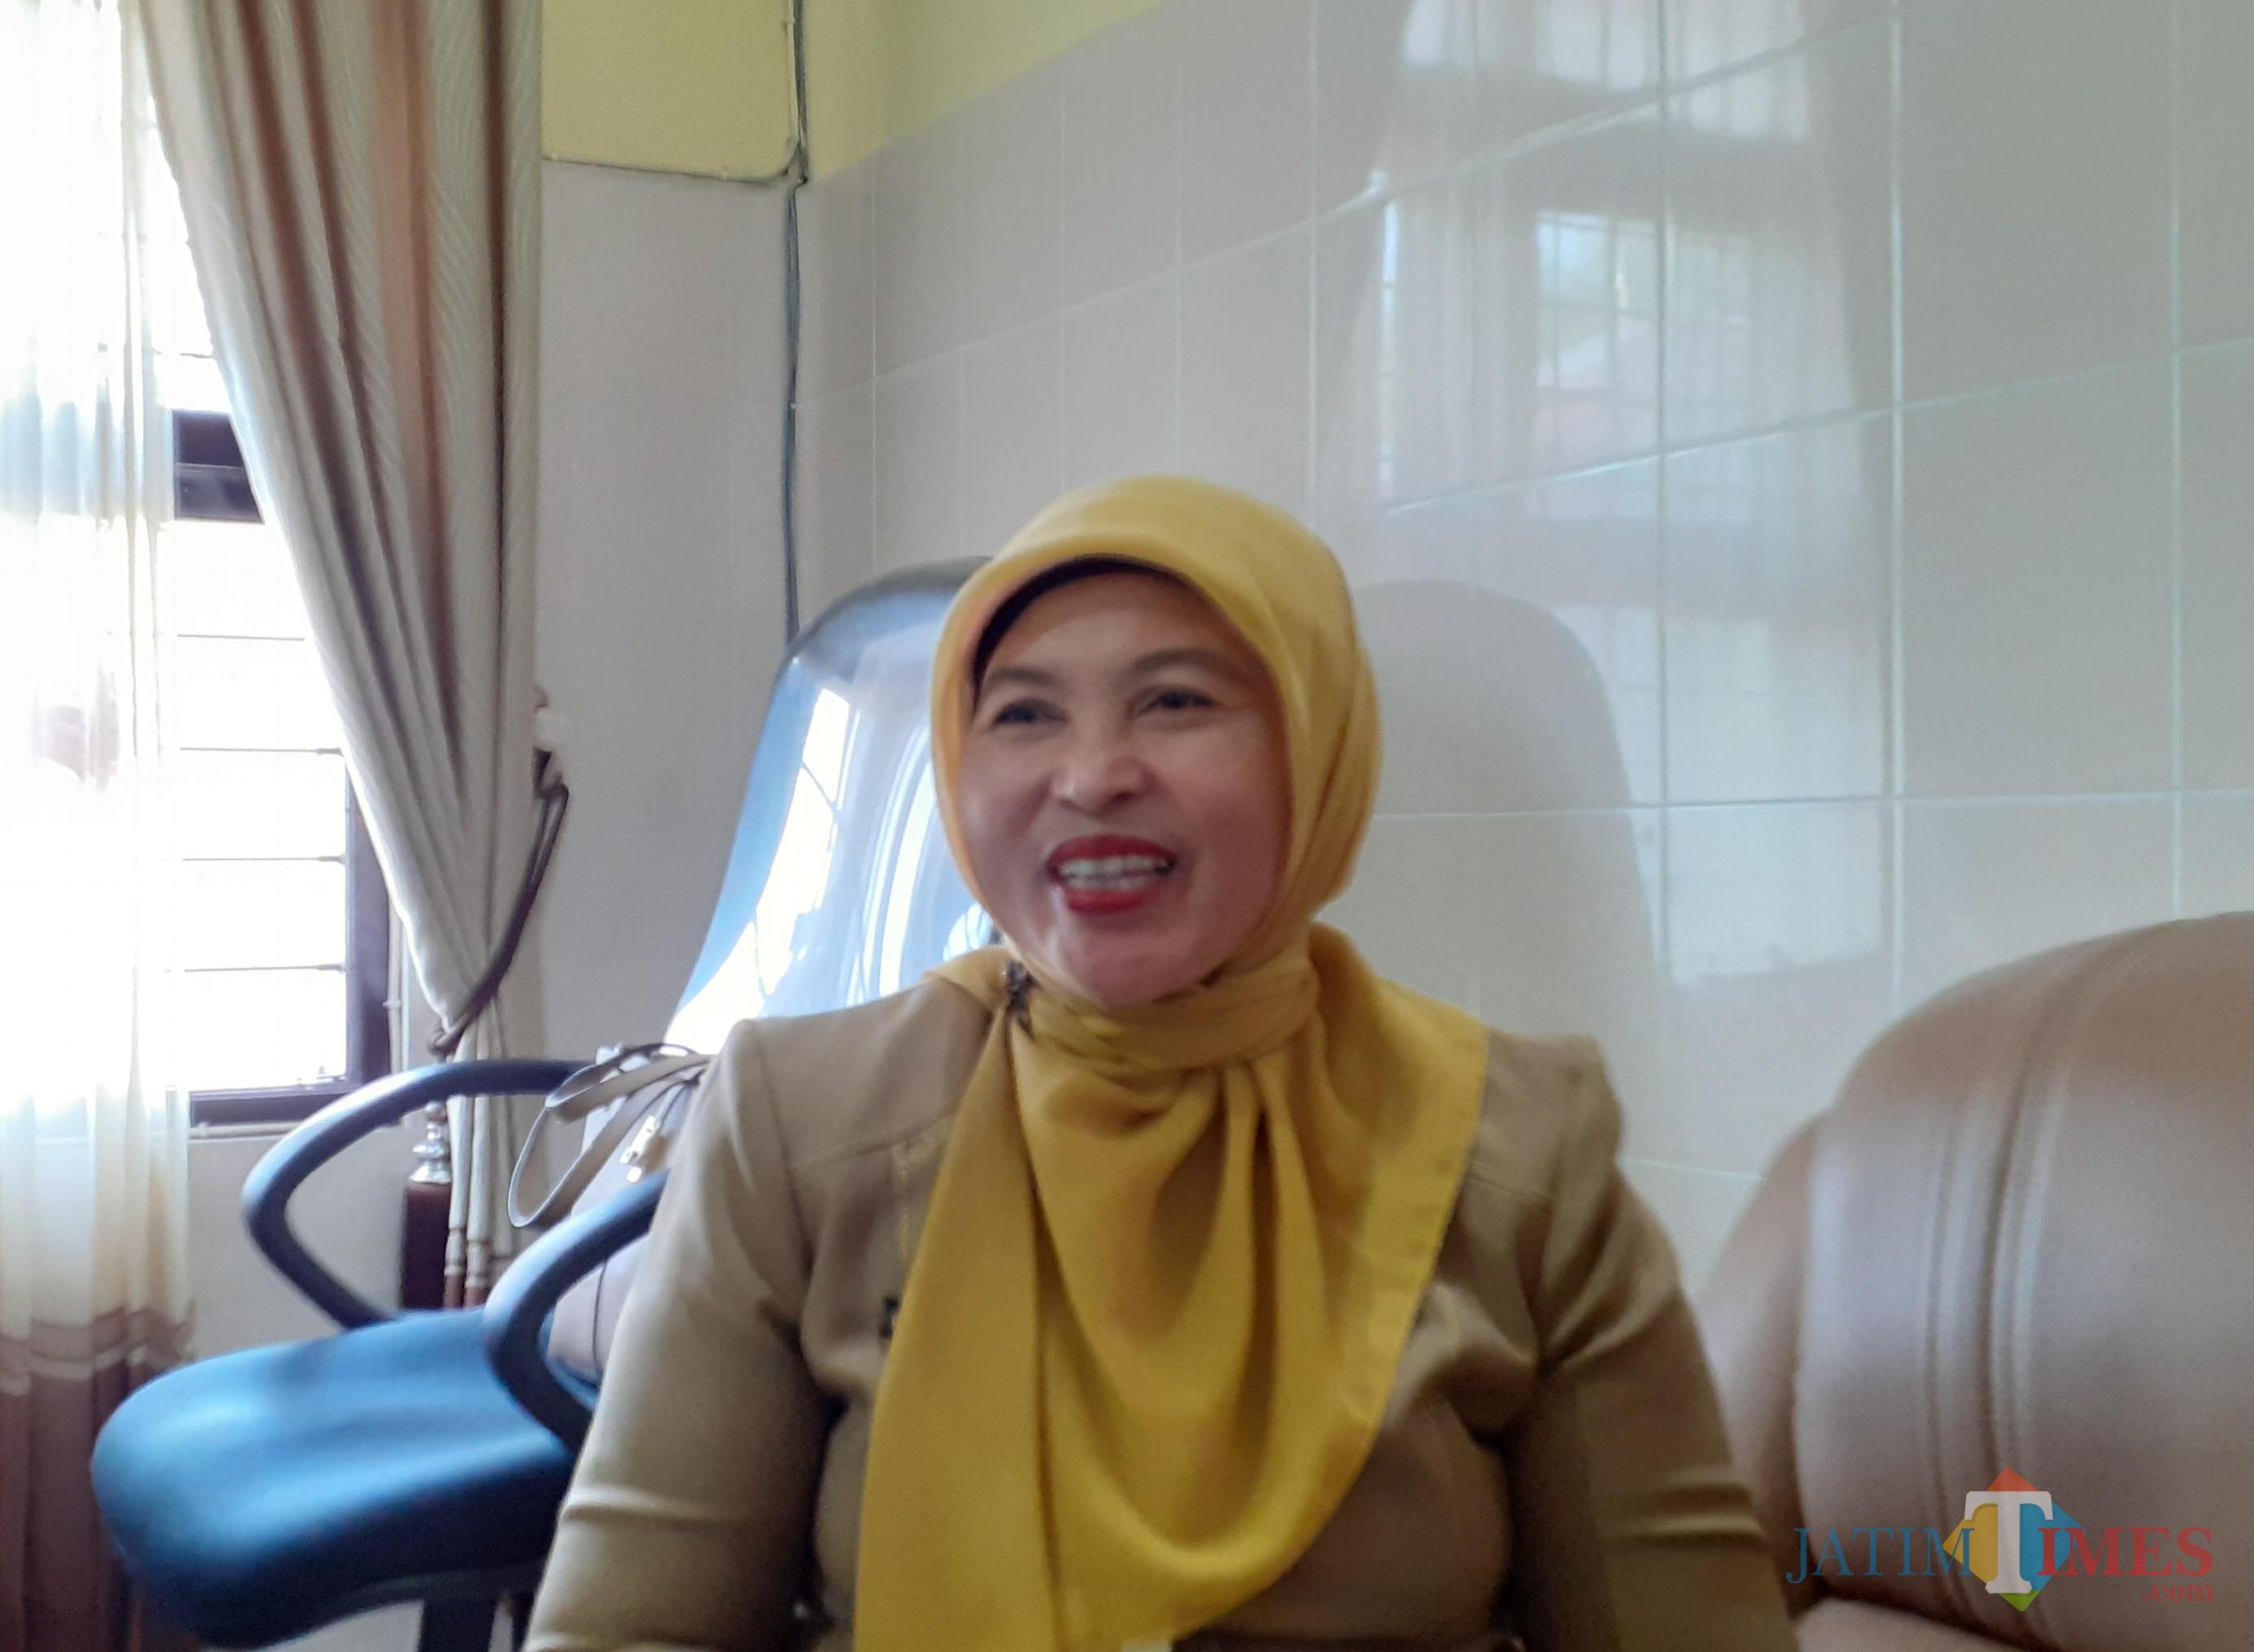 Kepala Puskesmas Janti Endang Listyowati (Arifina Cahyanti Firdausi/MalangTIMES)